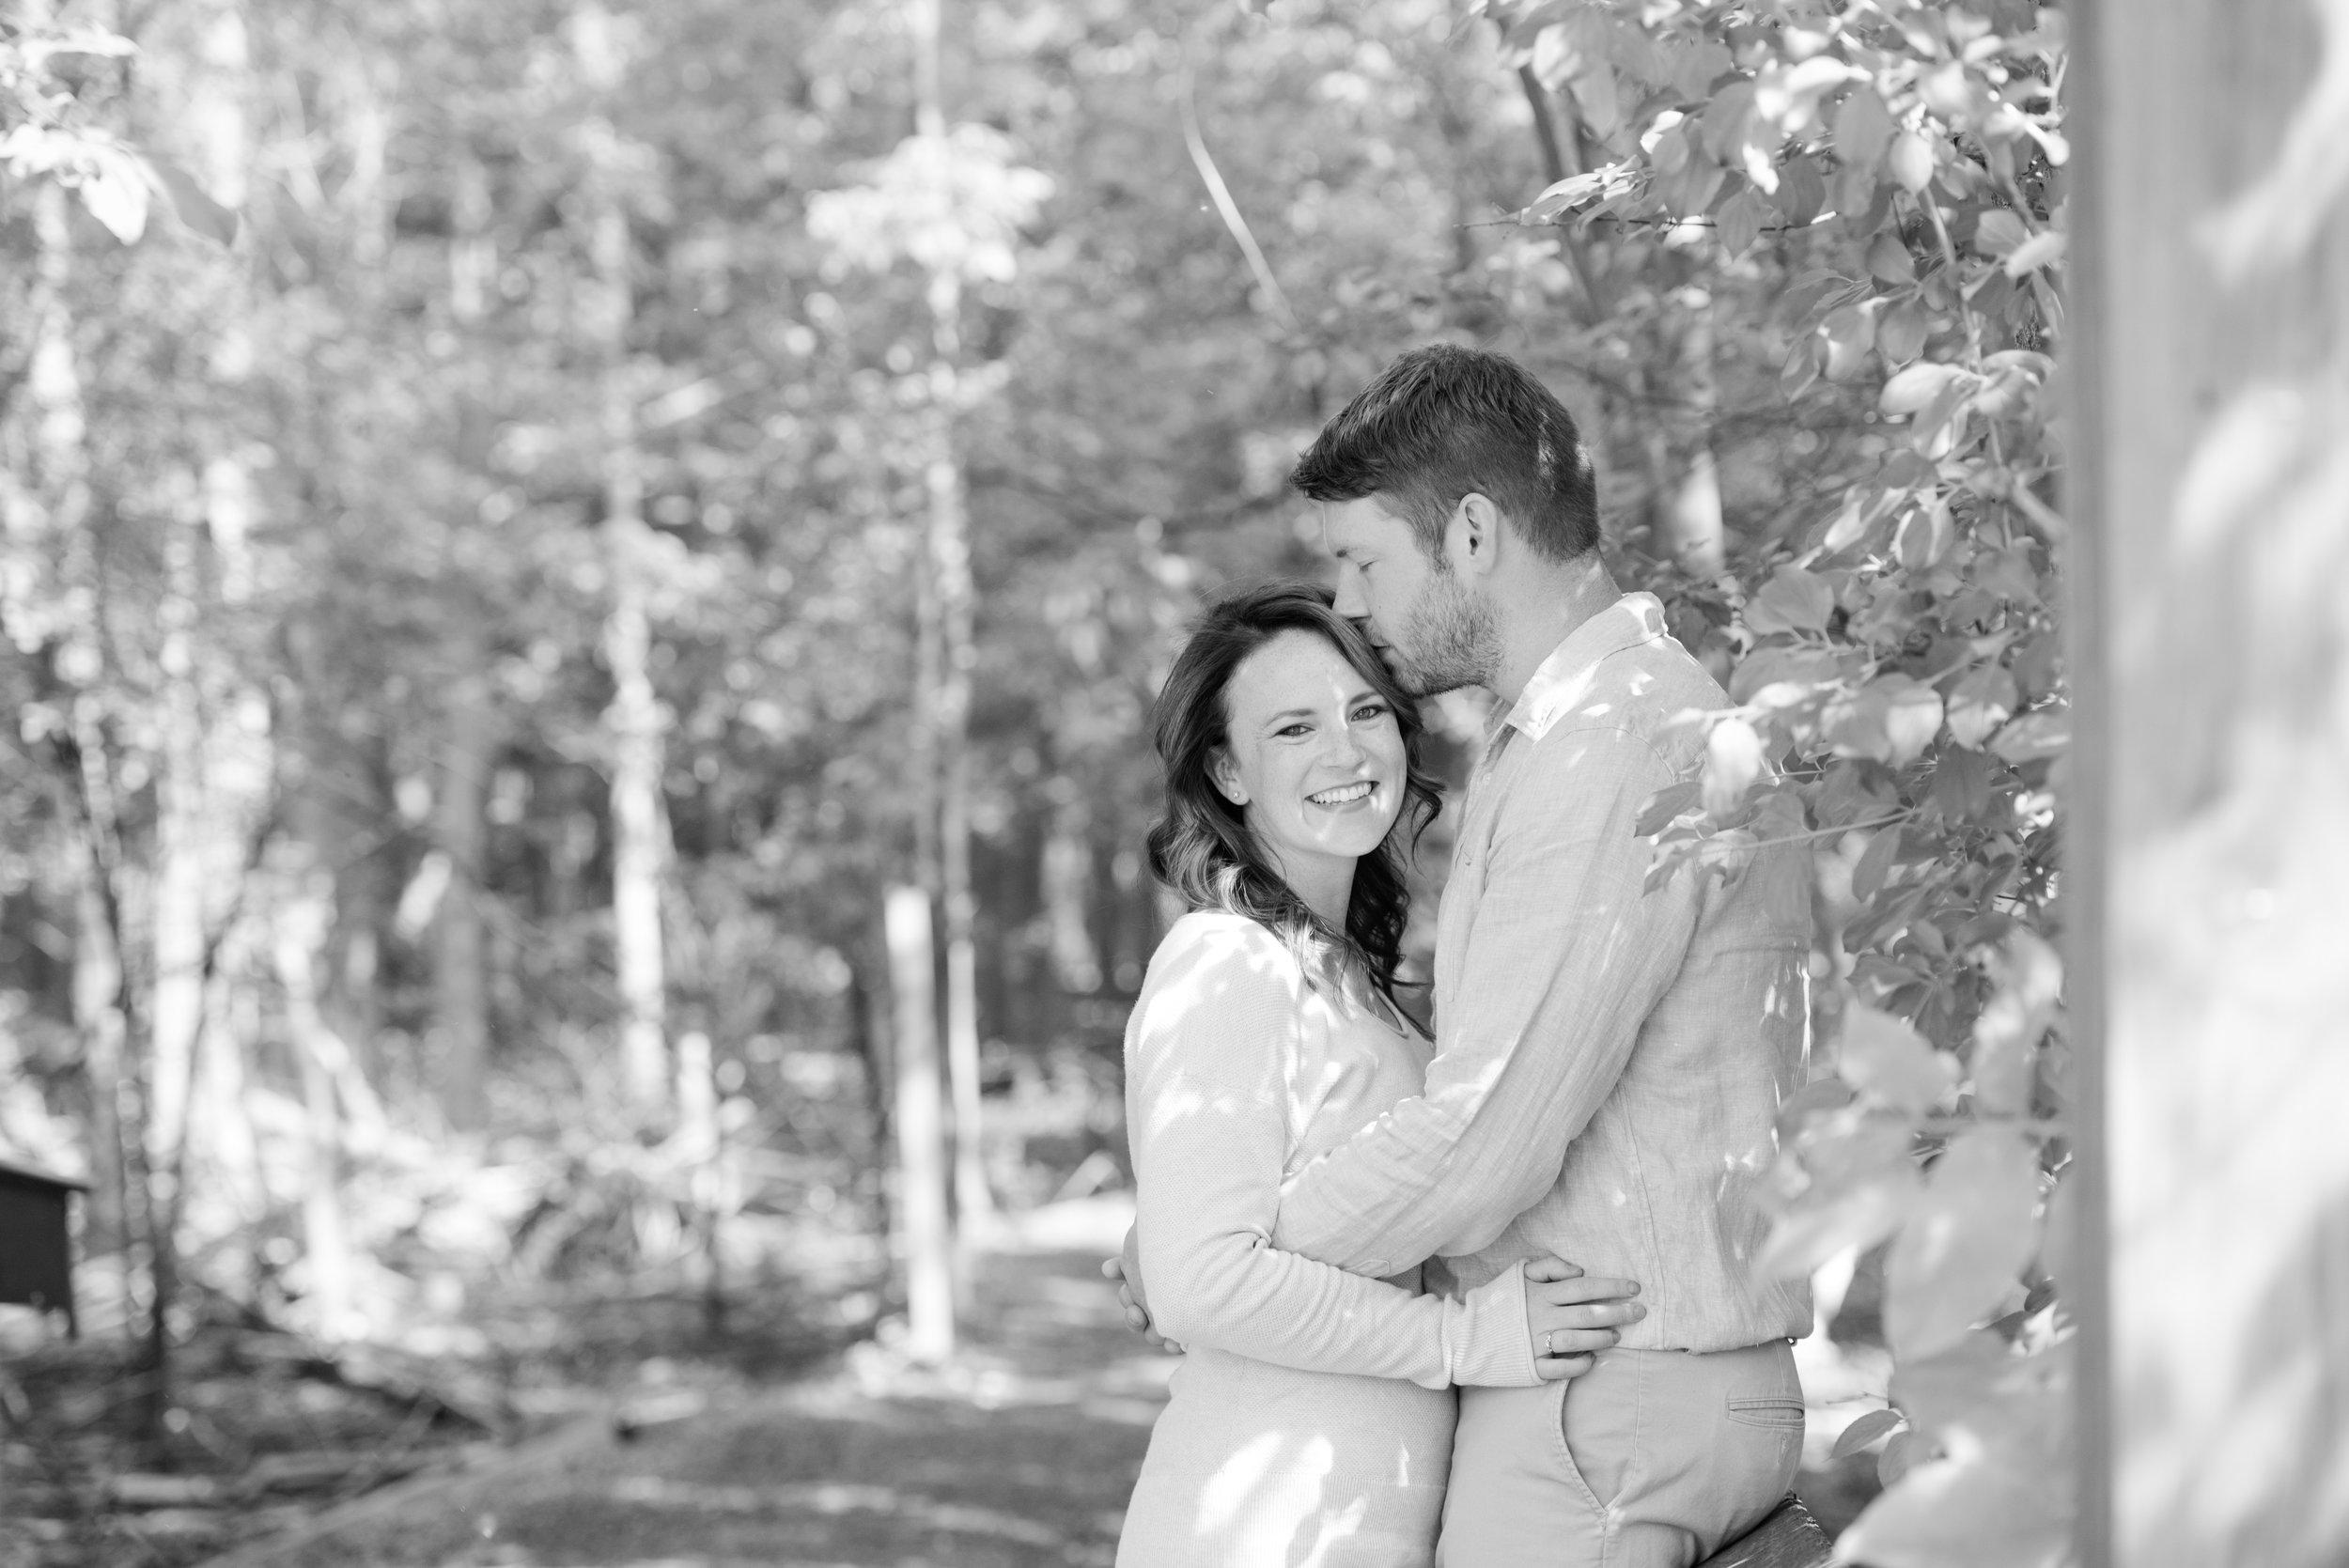 GALLERY-2019-6-9 Kaitlin, Justin & Liam Engagement 0515 58.jpg